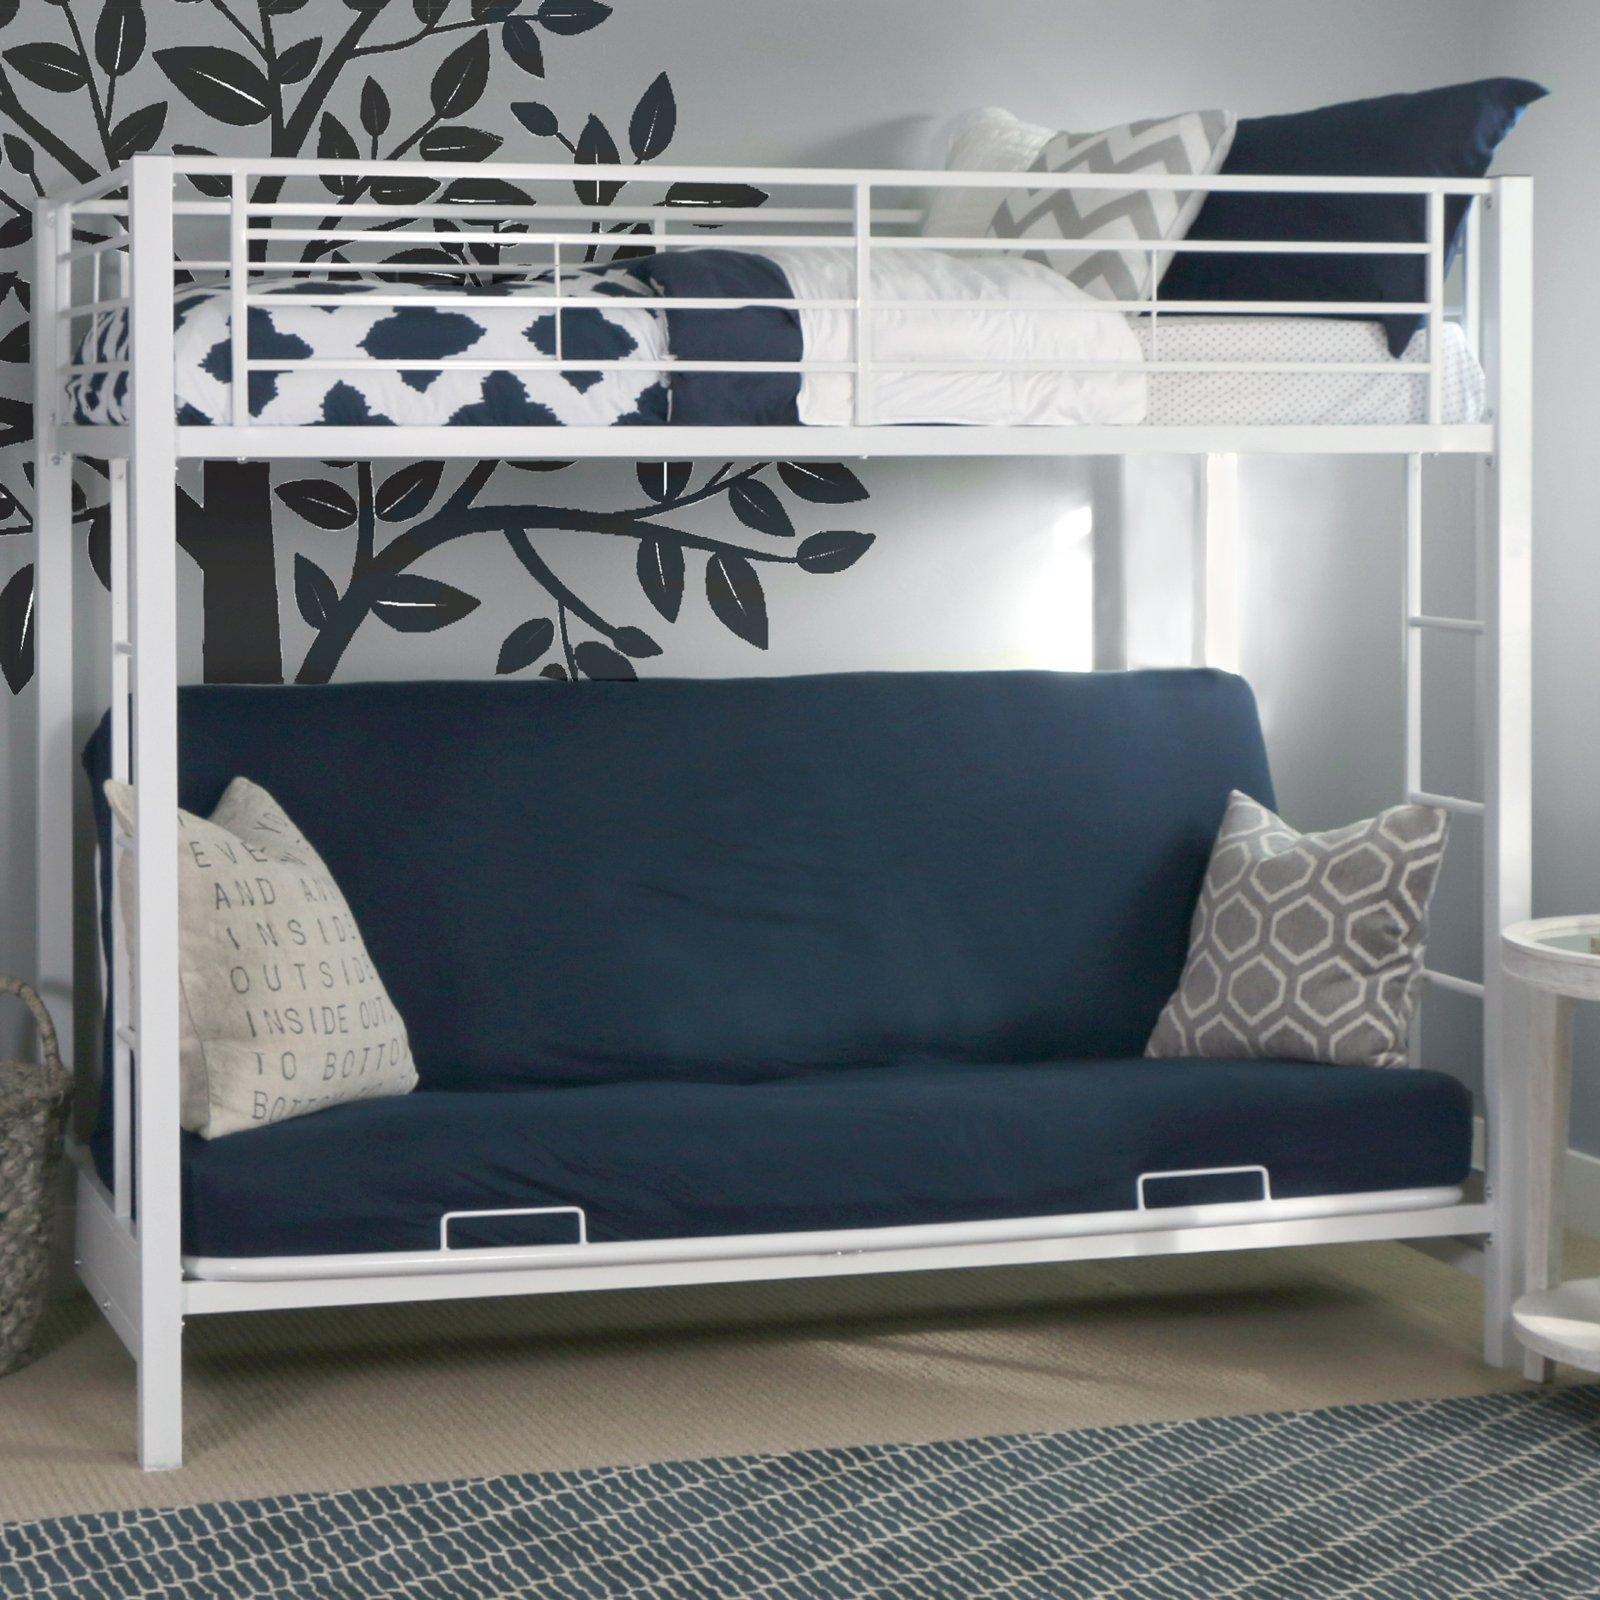 Mattresses : Full Size Bunk Bed Mattress Kmart Bunk Beds With Intended For Kmart Bunk Bed Mattress (Image 15 of 20)